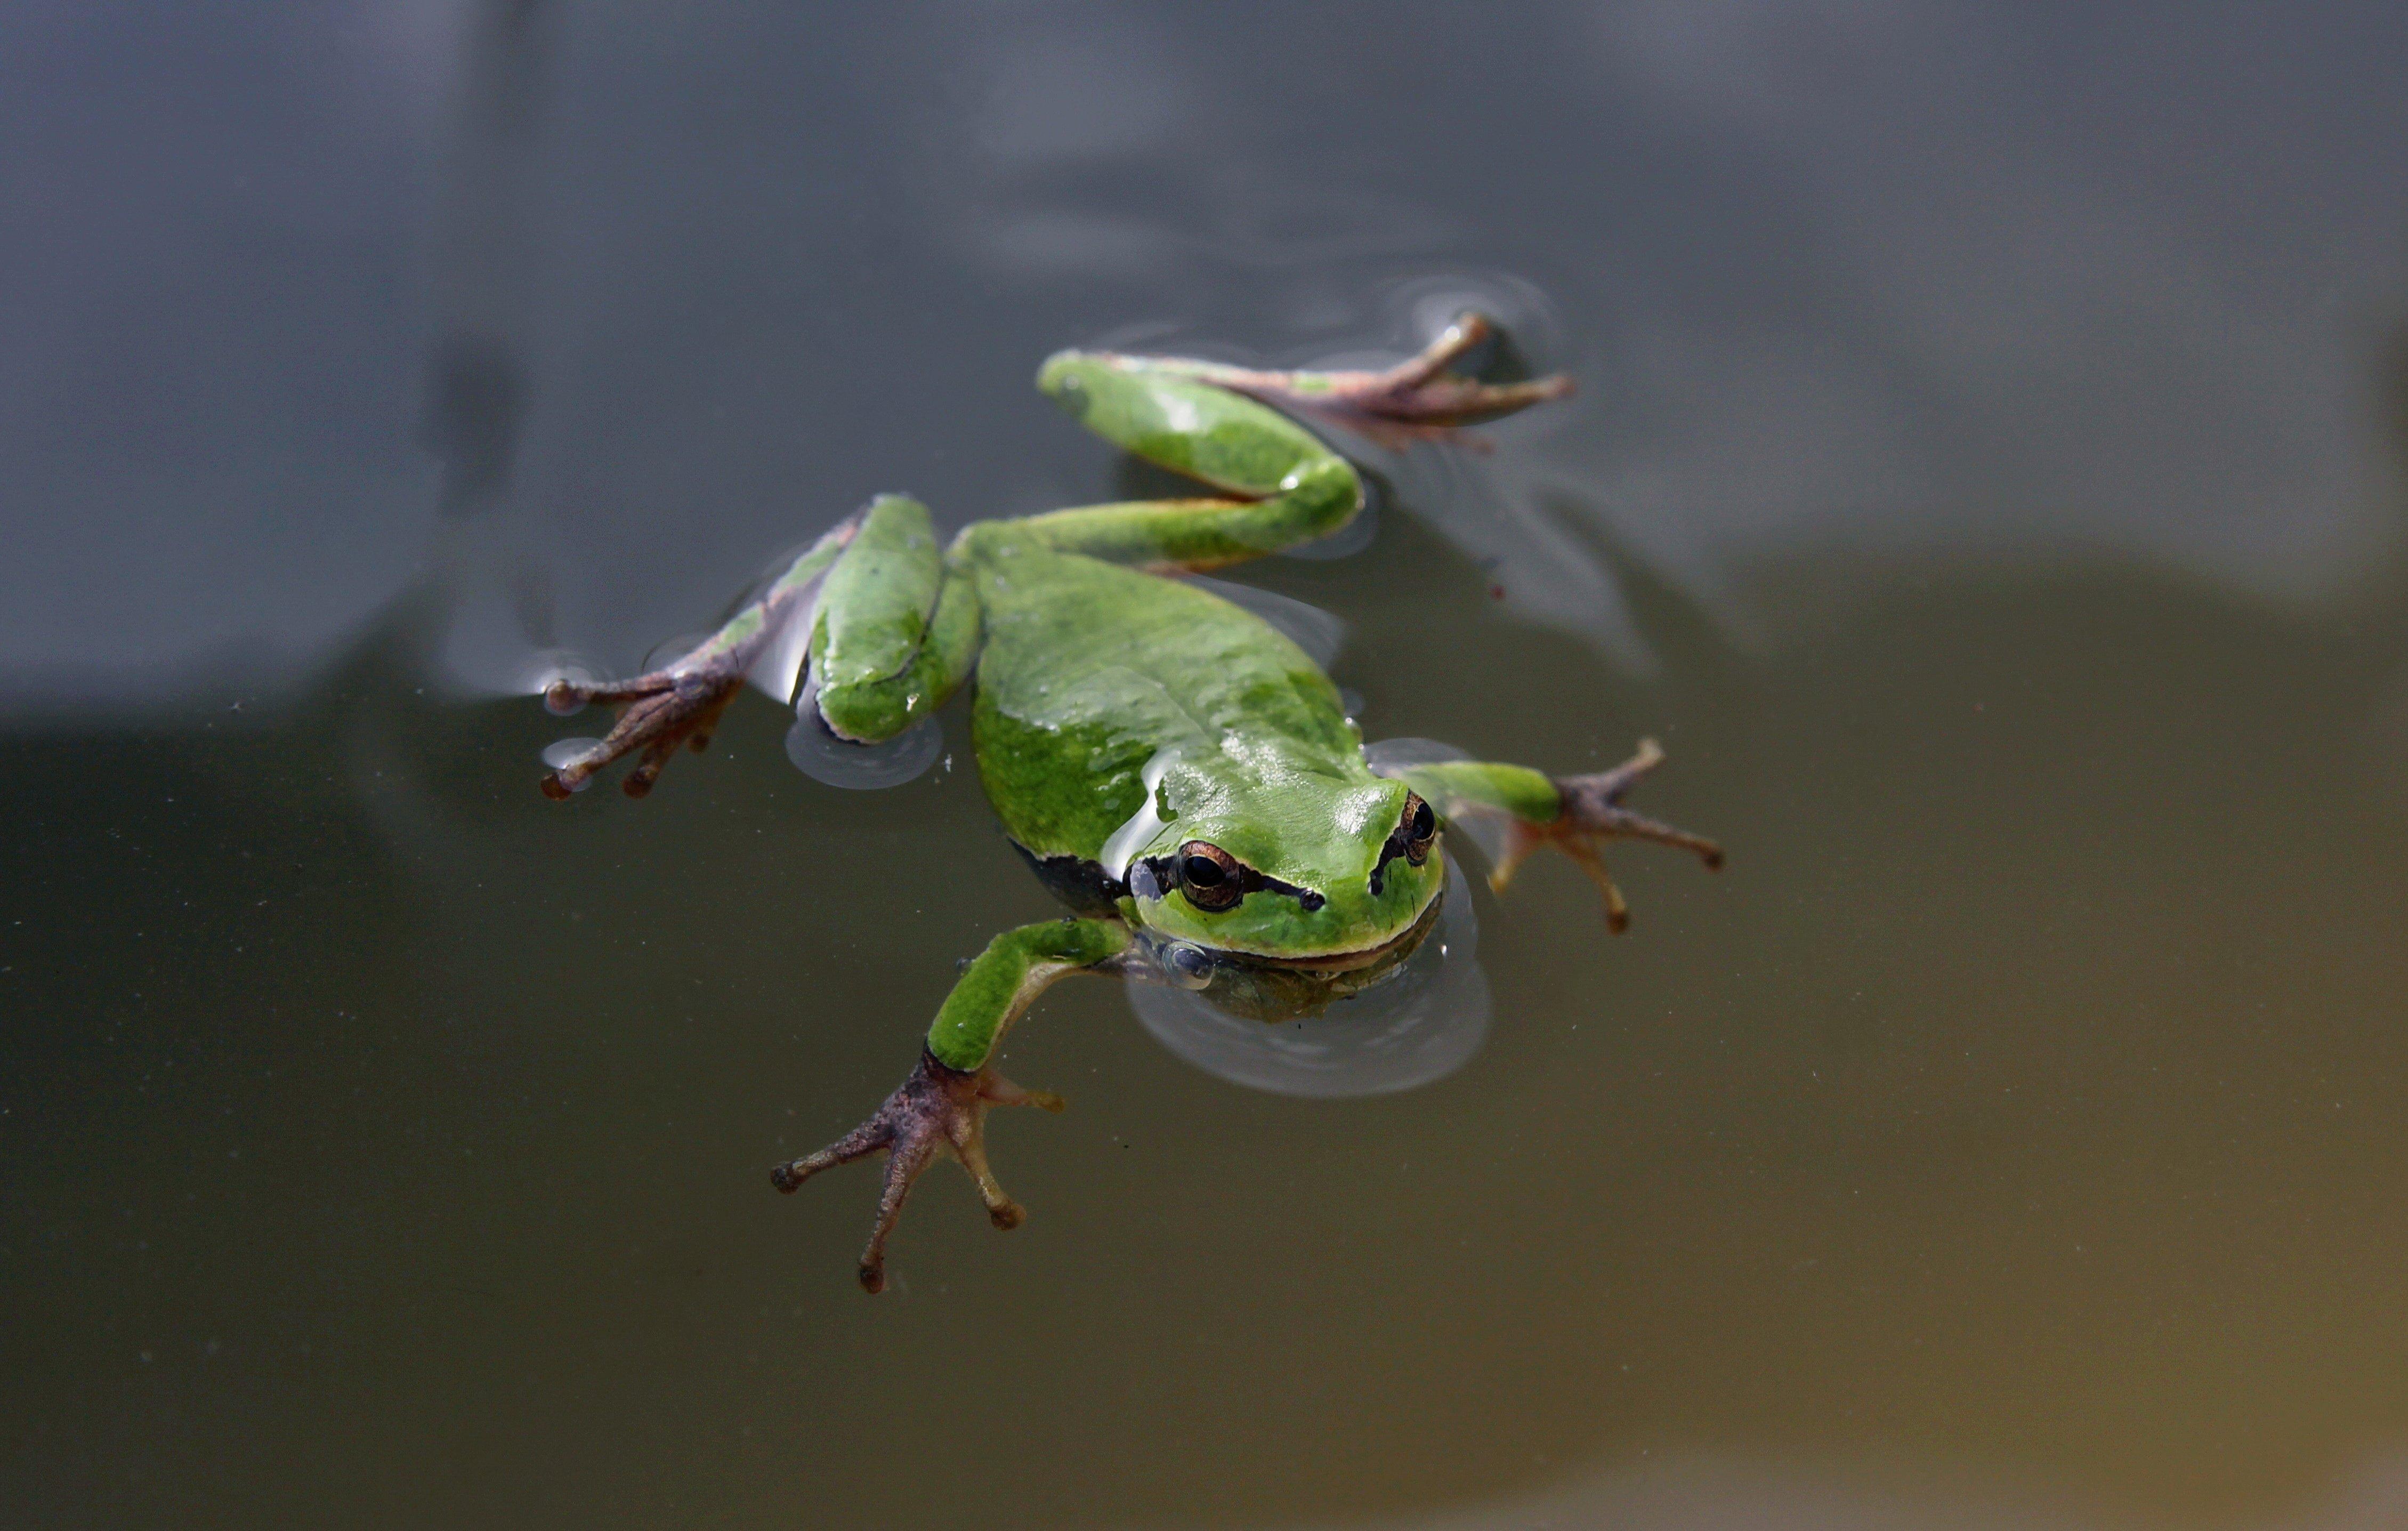 Swimming Frog Green Eyes Wallpaper 4518x2872 620610 Wallpaperup